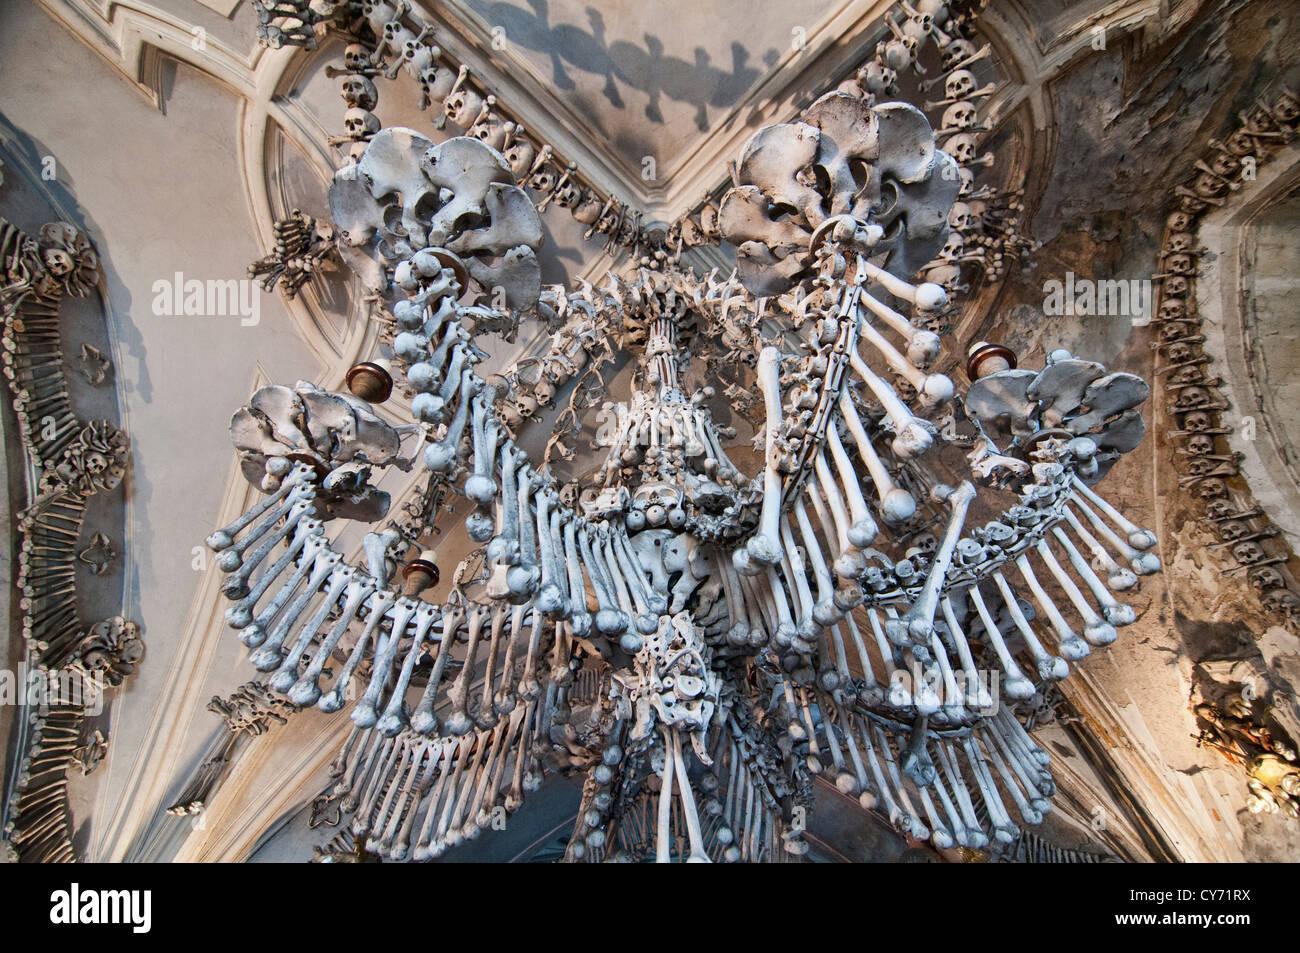 The Bizarre Bone Church At Kutna Hora Near Prague Czech Republic Where Everything